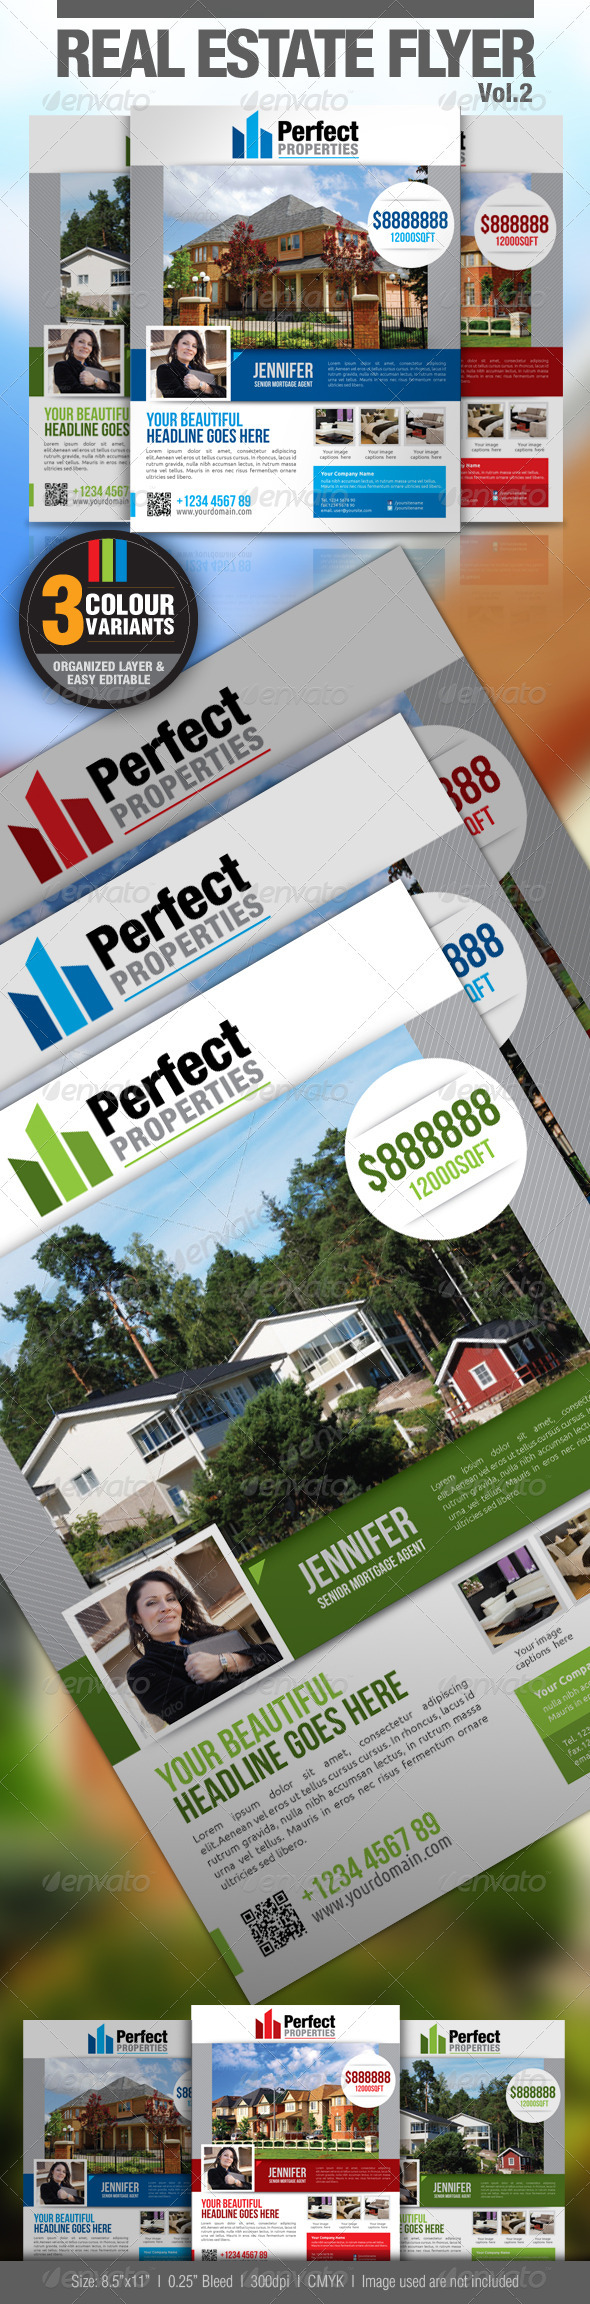 GraphicRiver Real Estate Flyer Vol.2 2608184